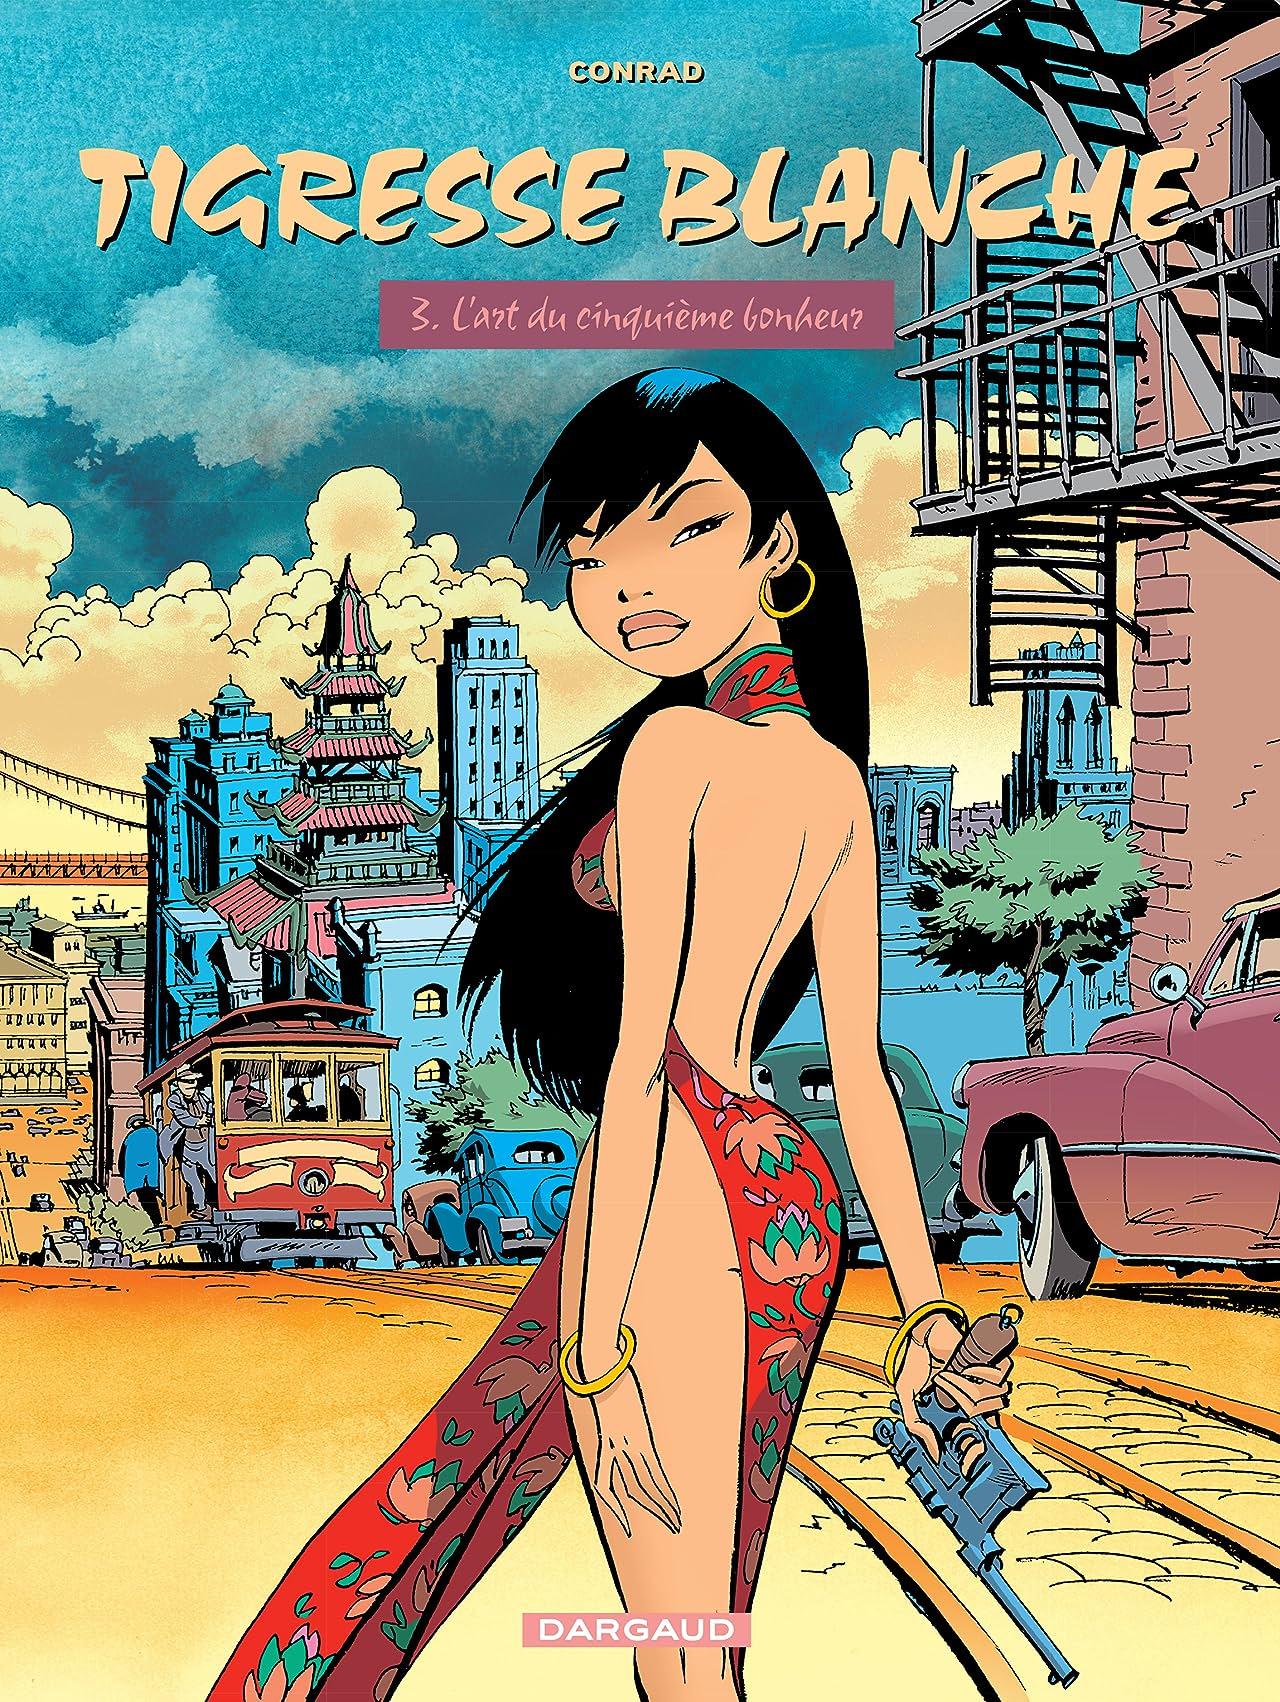 Tigresse Blanche Vol. 3: L'Art du 5ème Bonheur